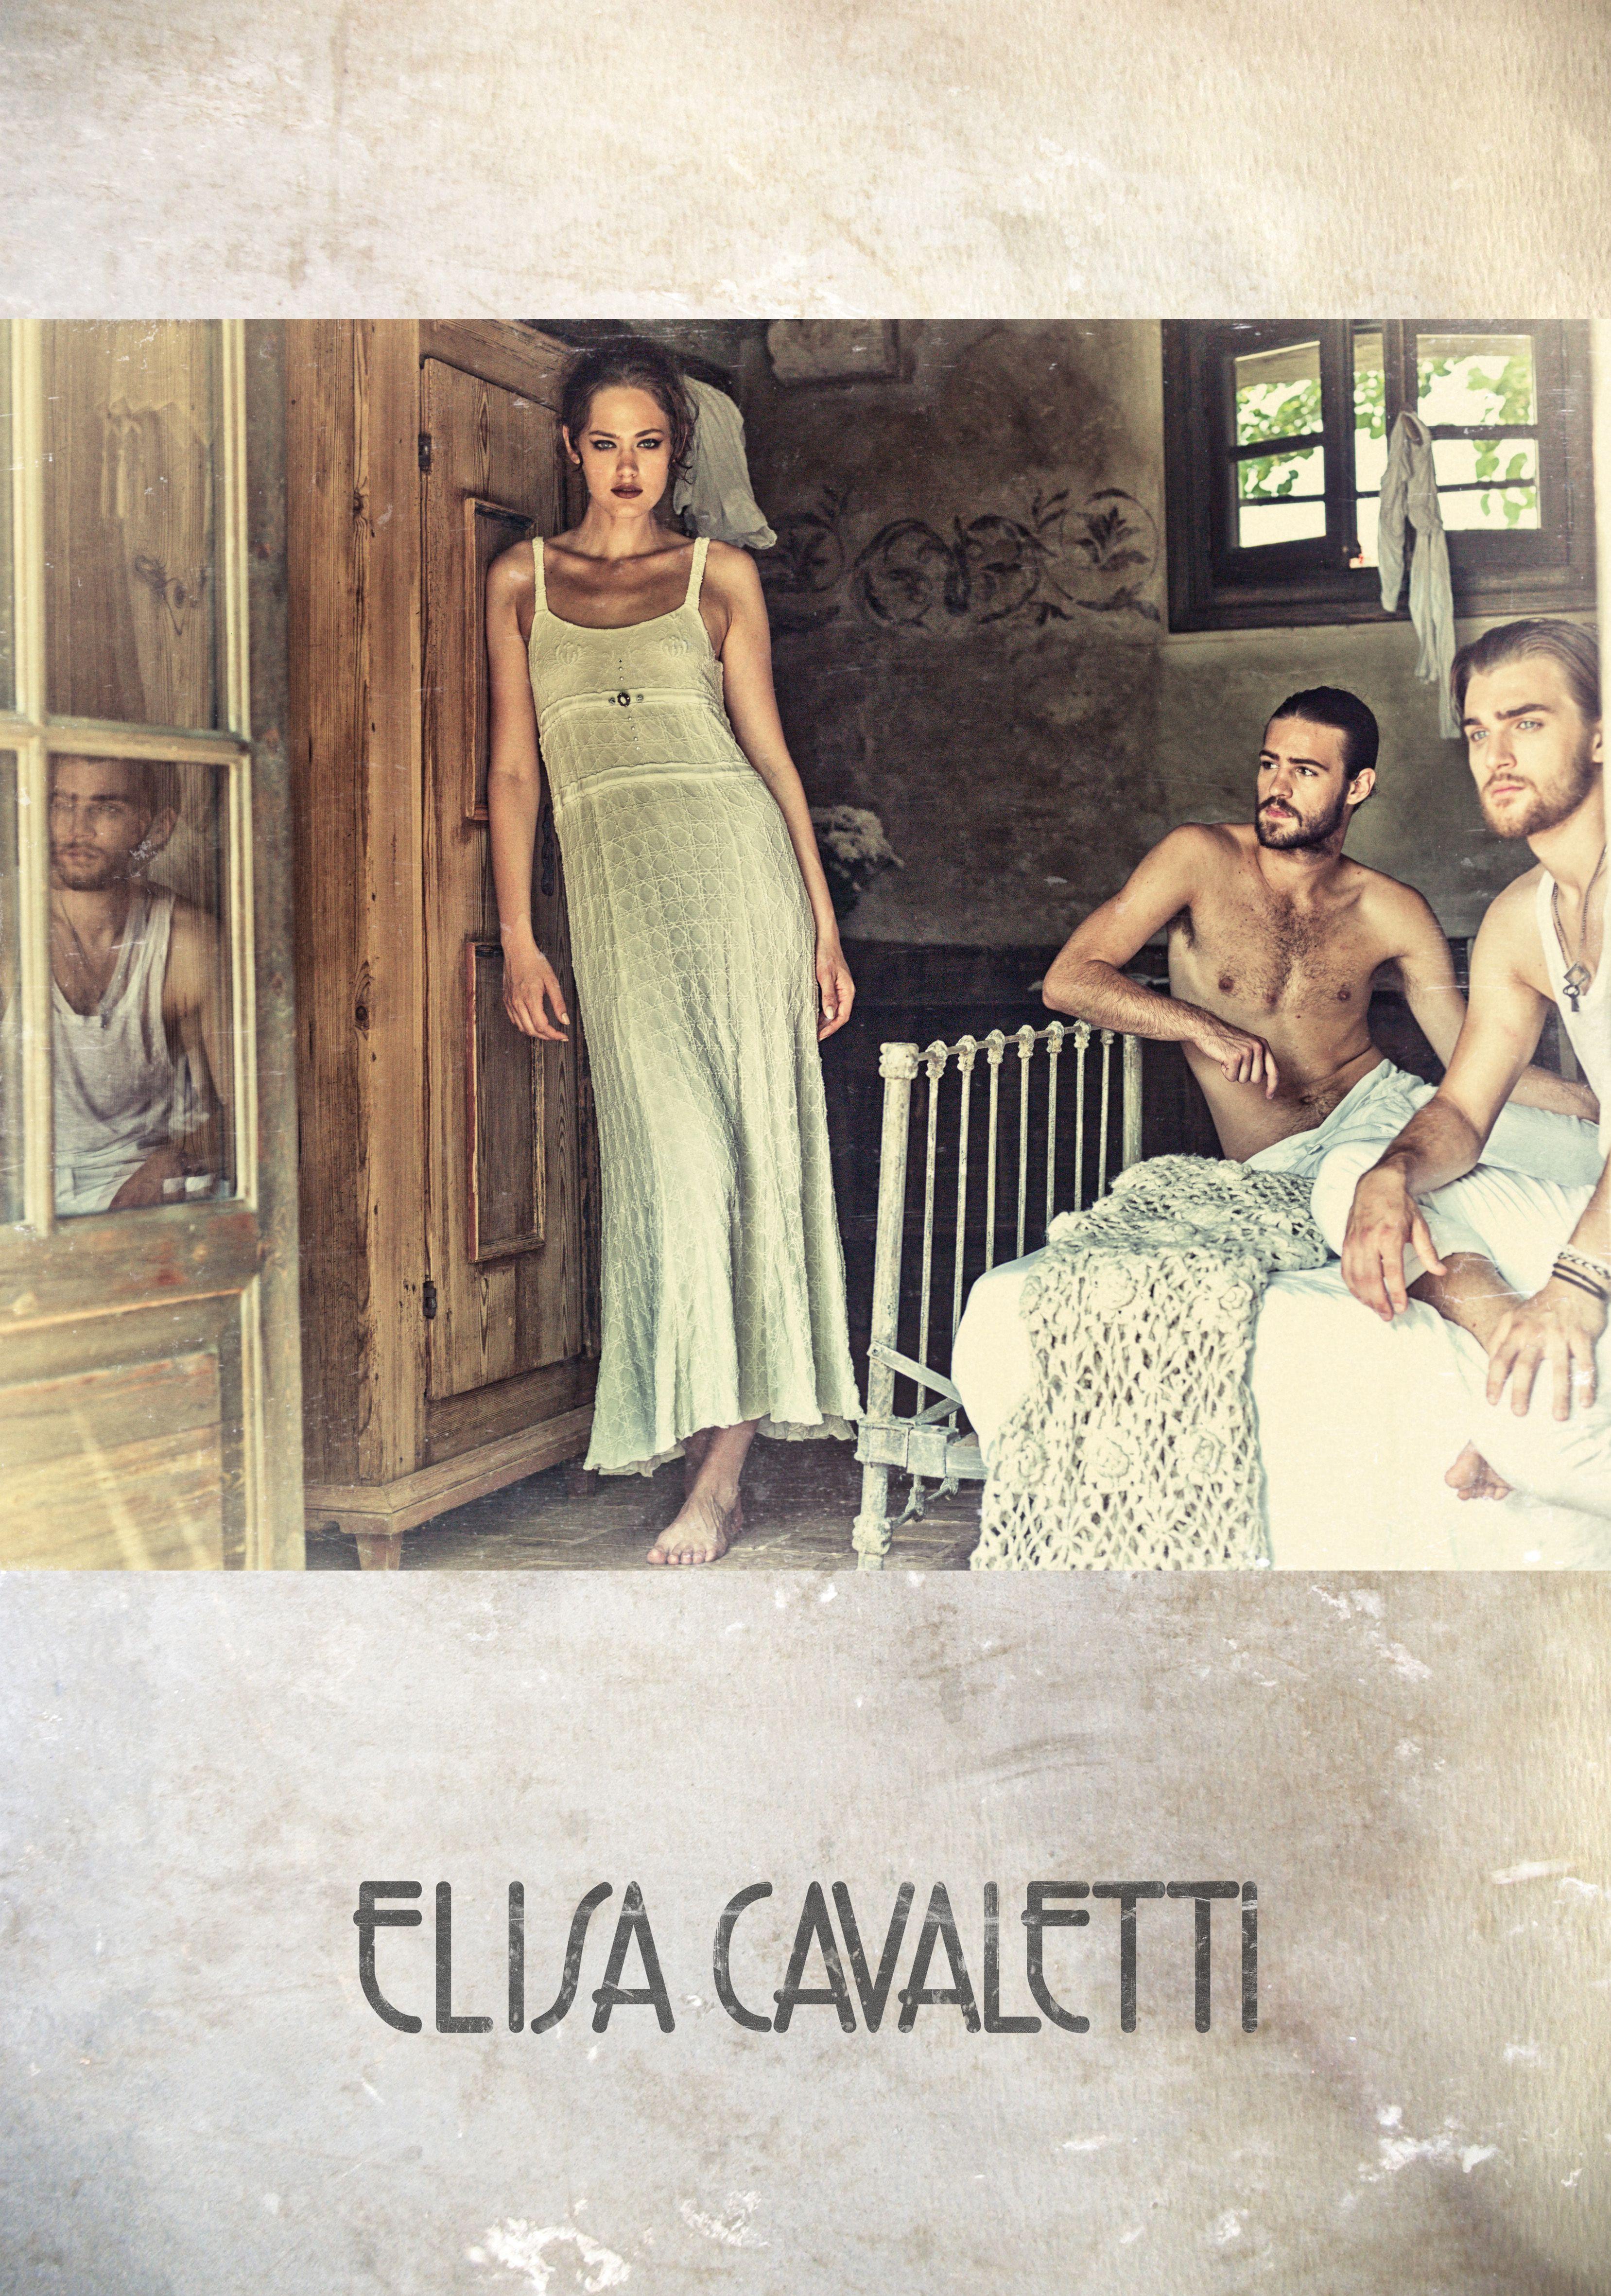 Elisa Cavaletti the fashion brand from Spain http://www.zwijnenburgmode.nl/elisa-cavaletti